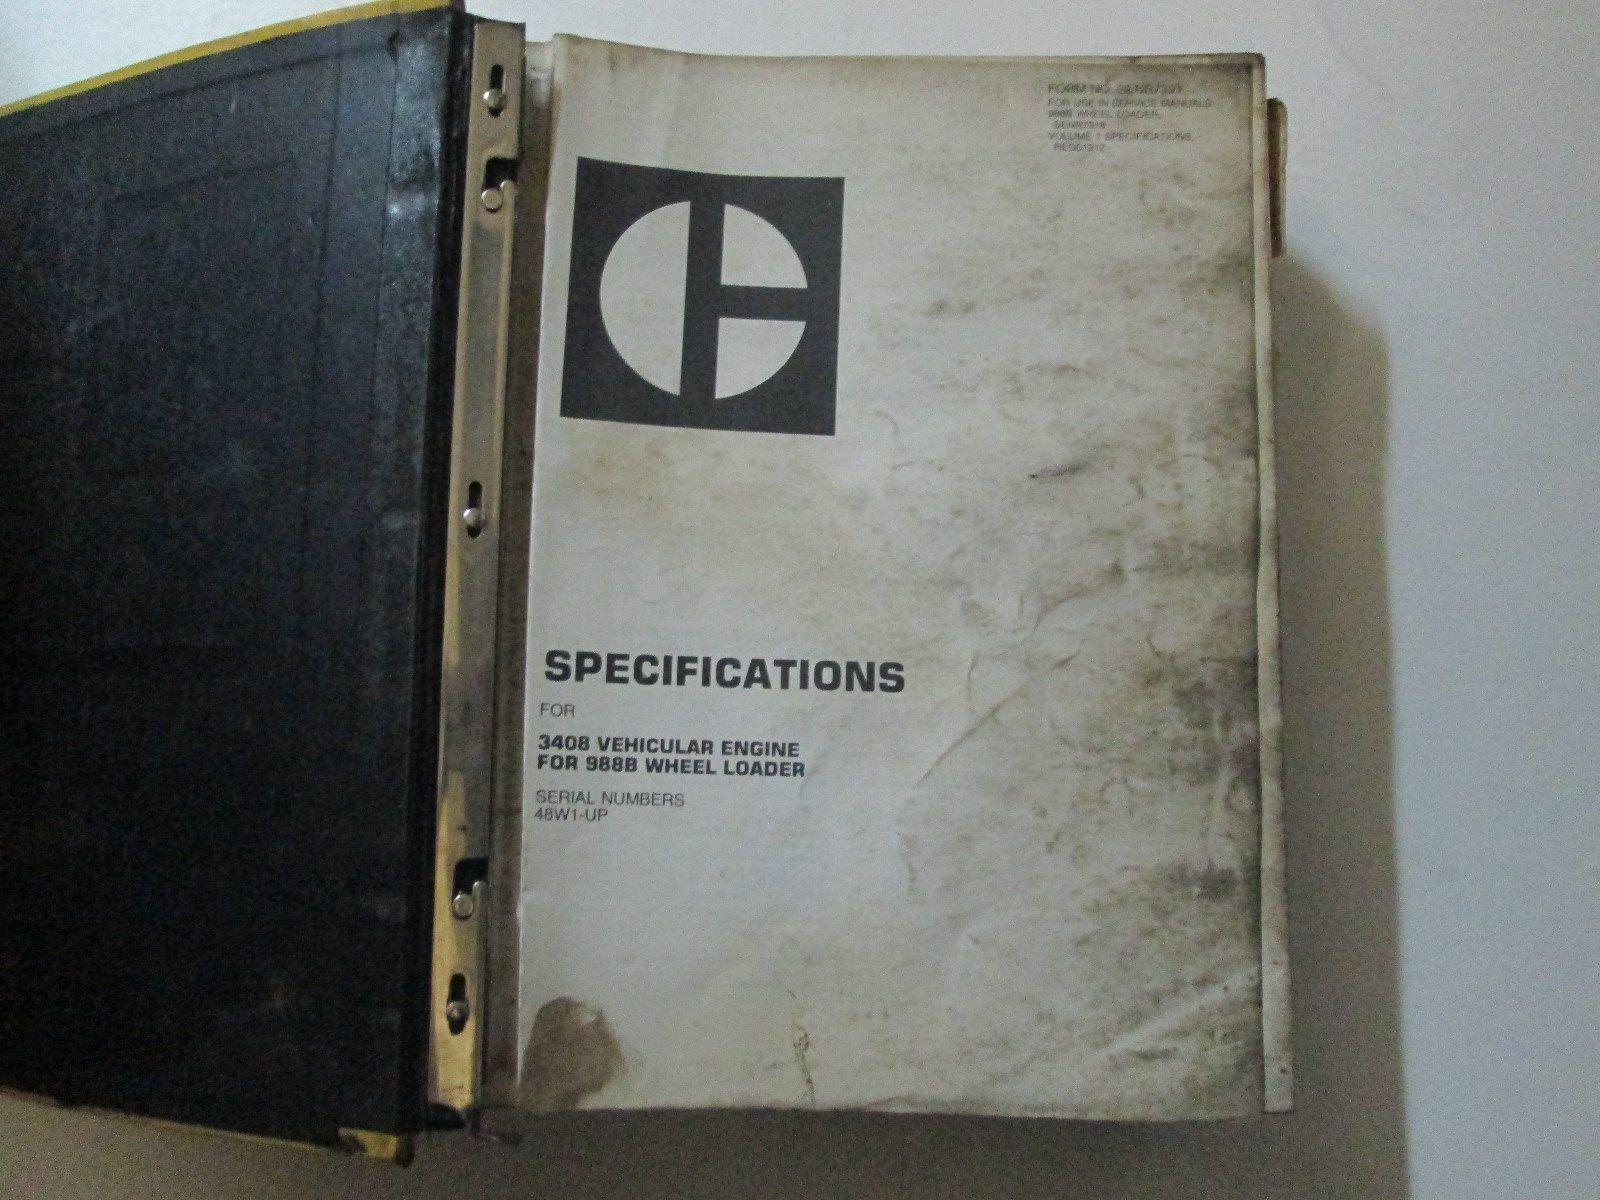 Caterpillar 988B Wheel Loader Service Manual and 50 similar